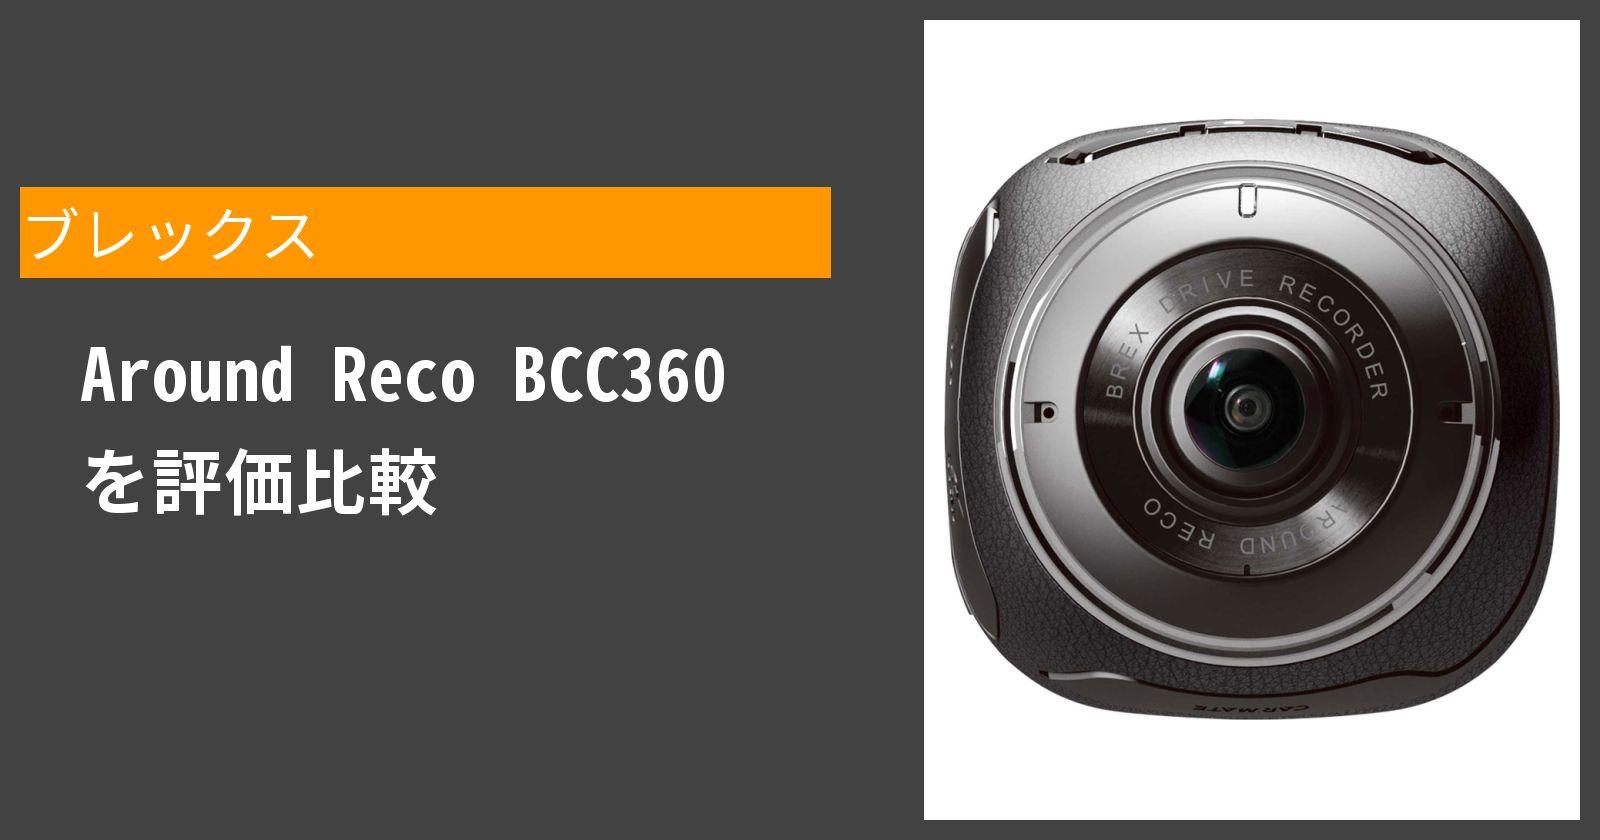 Around Reco BCC360を徹底評価